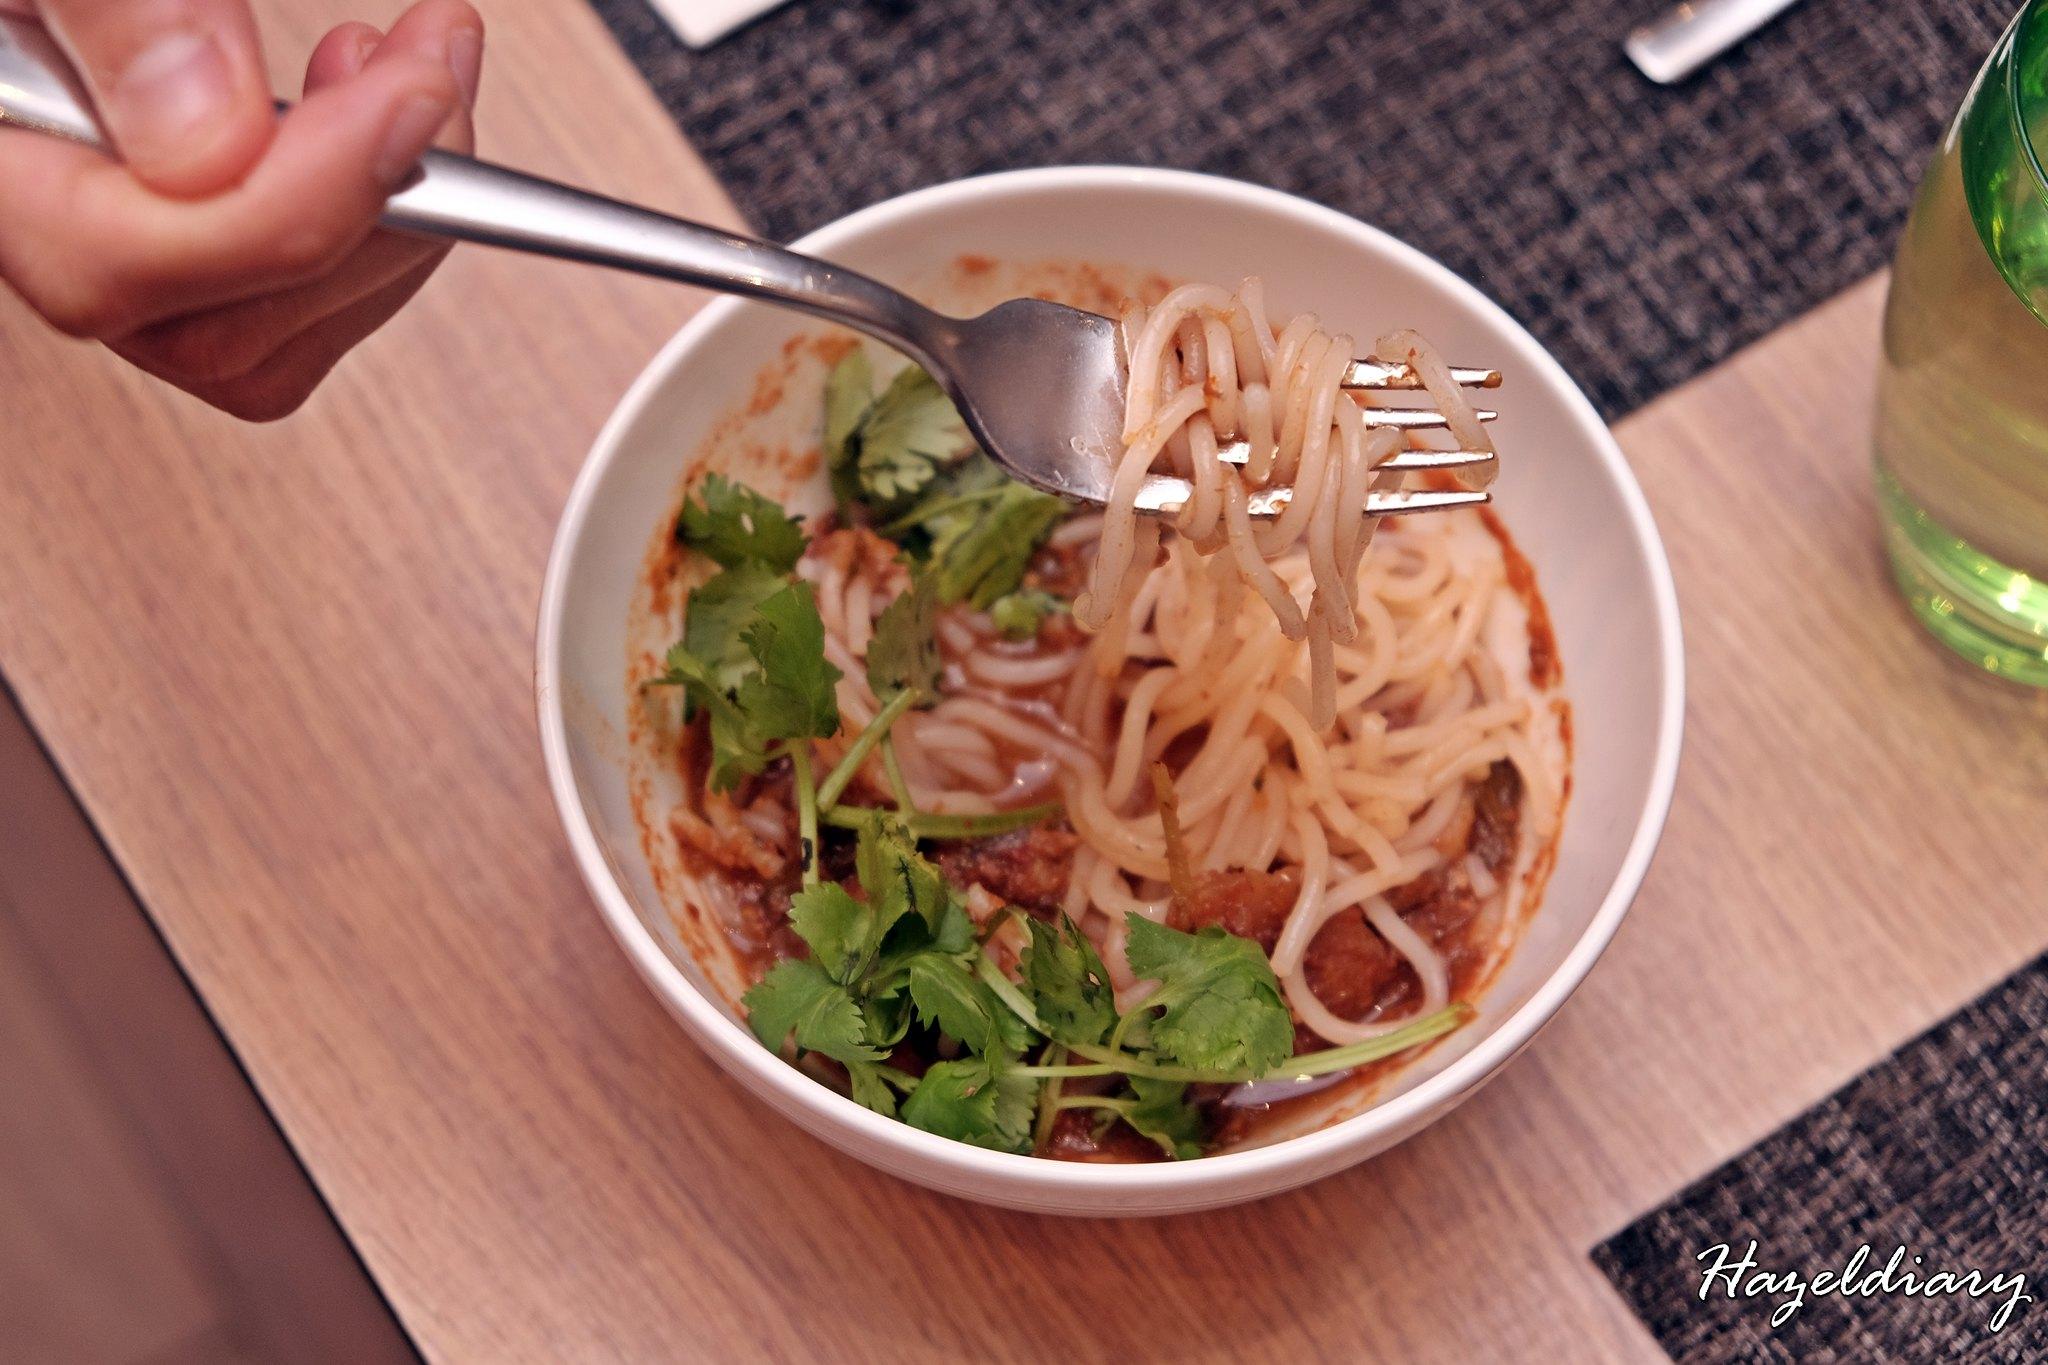 Penang Food Fare Buffet-Sky22 Courtyard Marriott-5 (2)